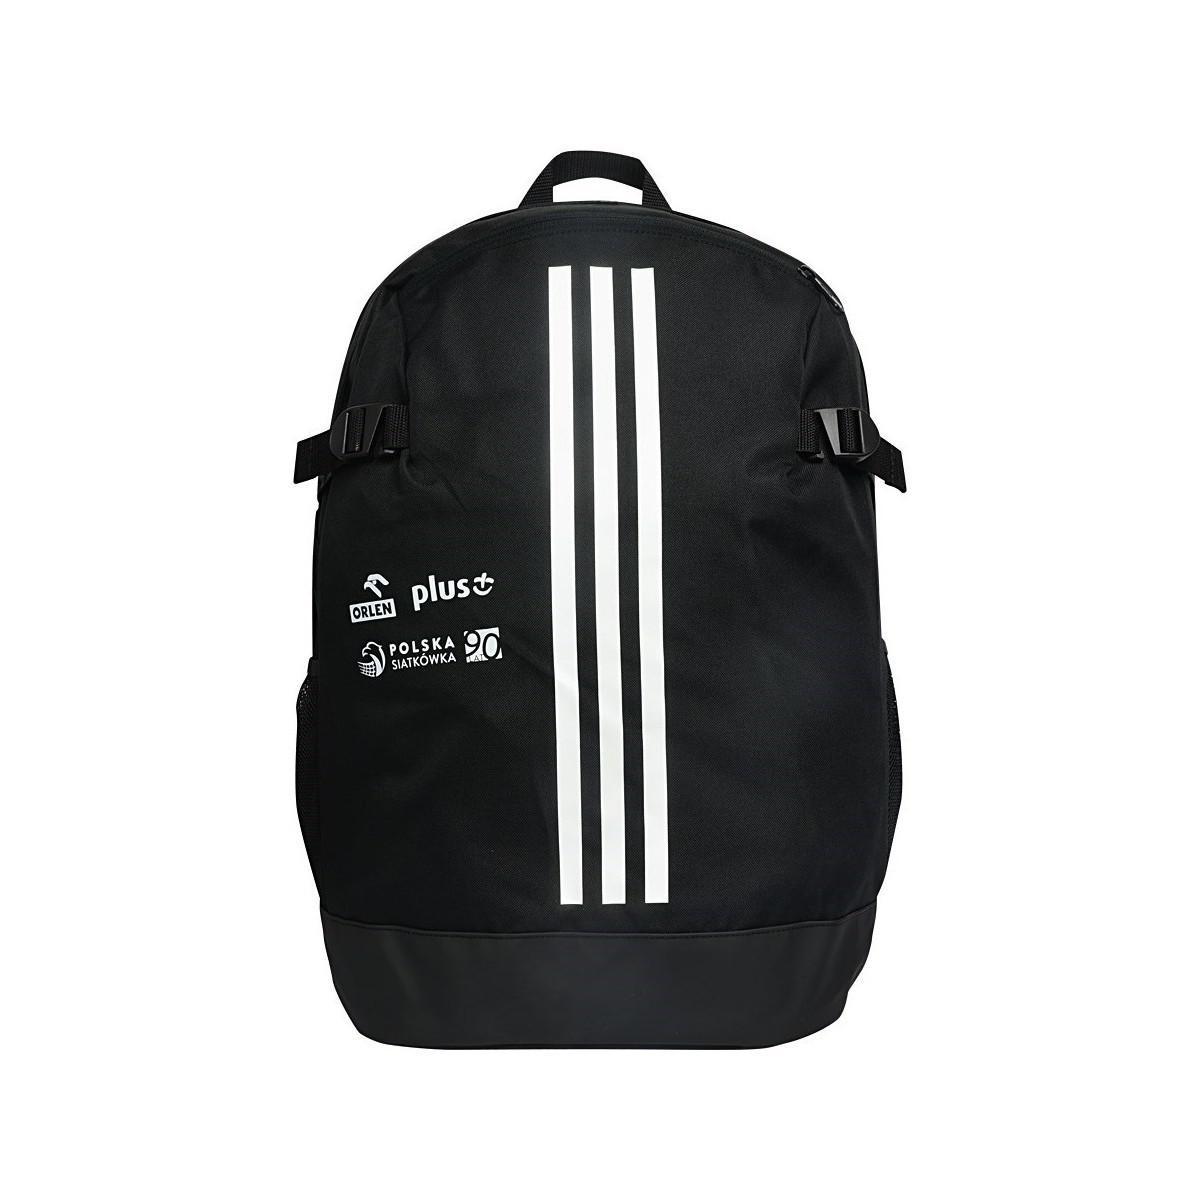 6484fe6b30 adidas Power Iv L Men s Backpack In Black in Black for Men - Lyst